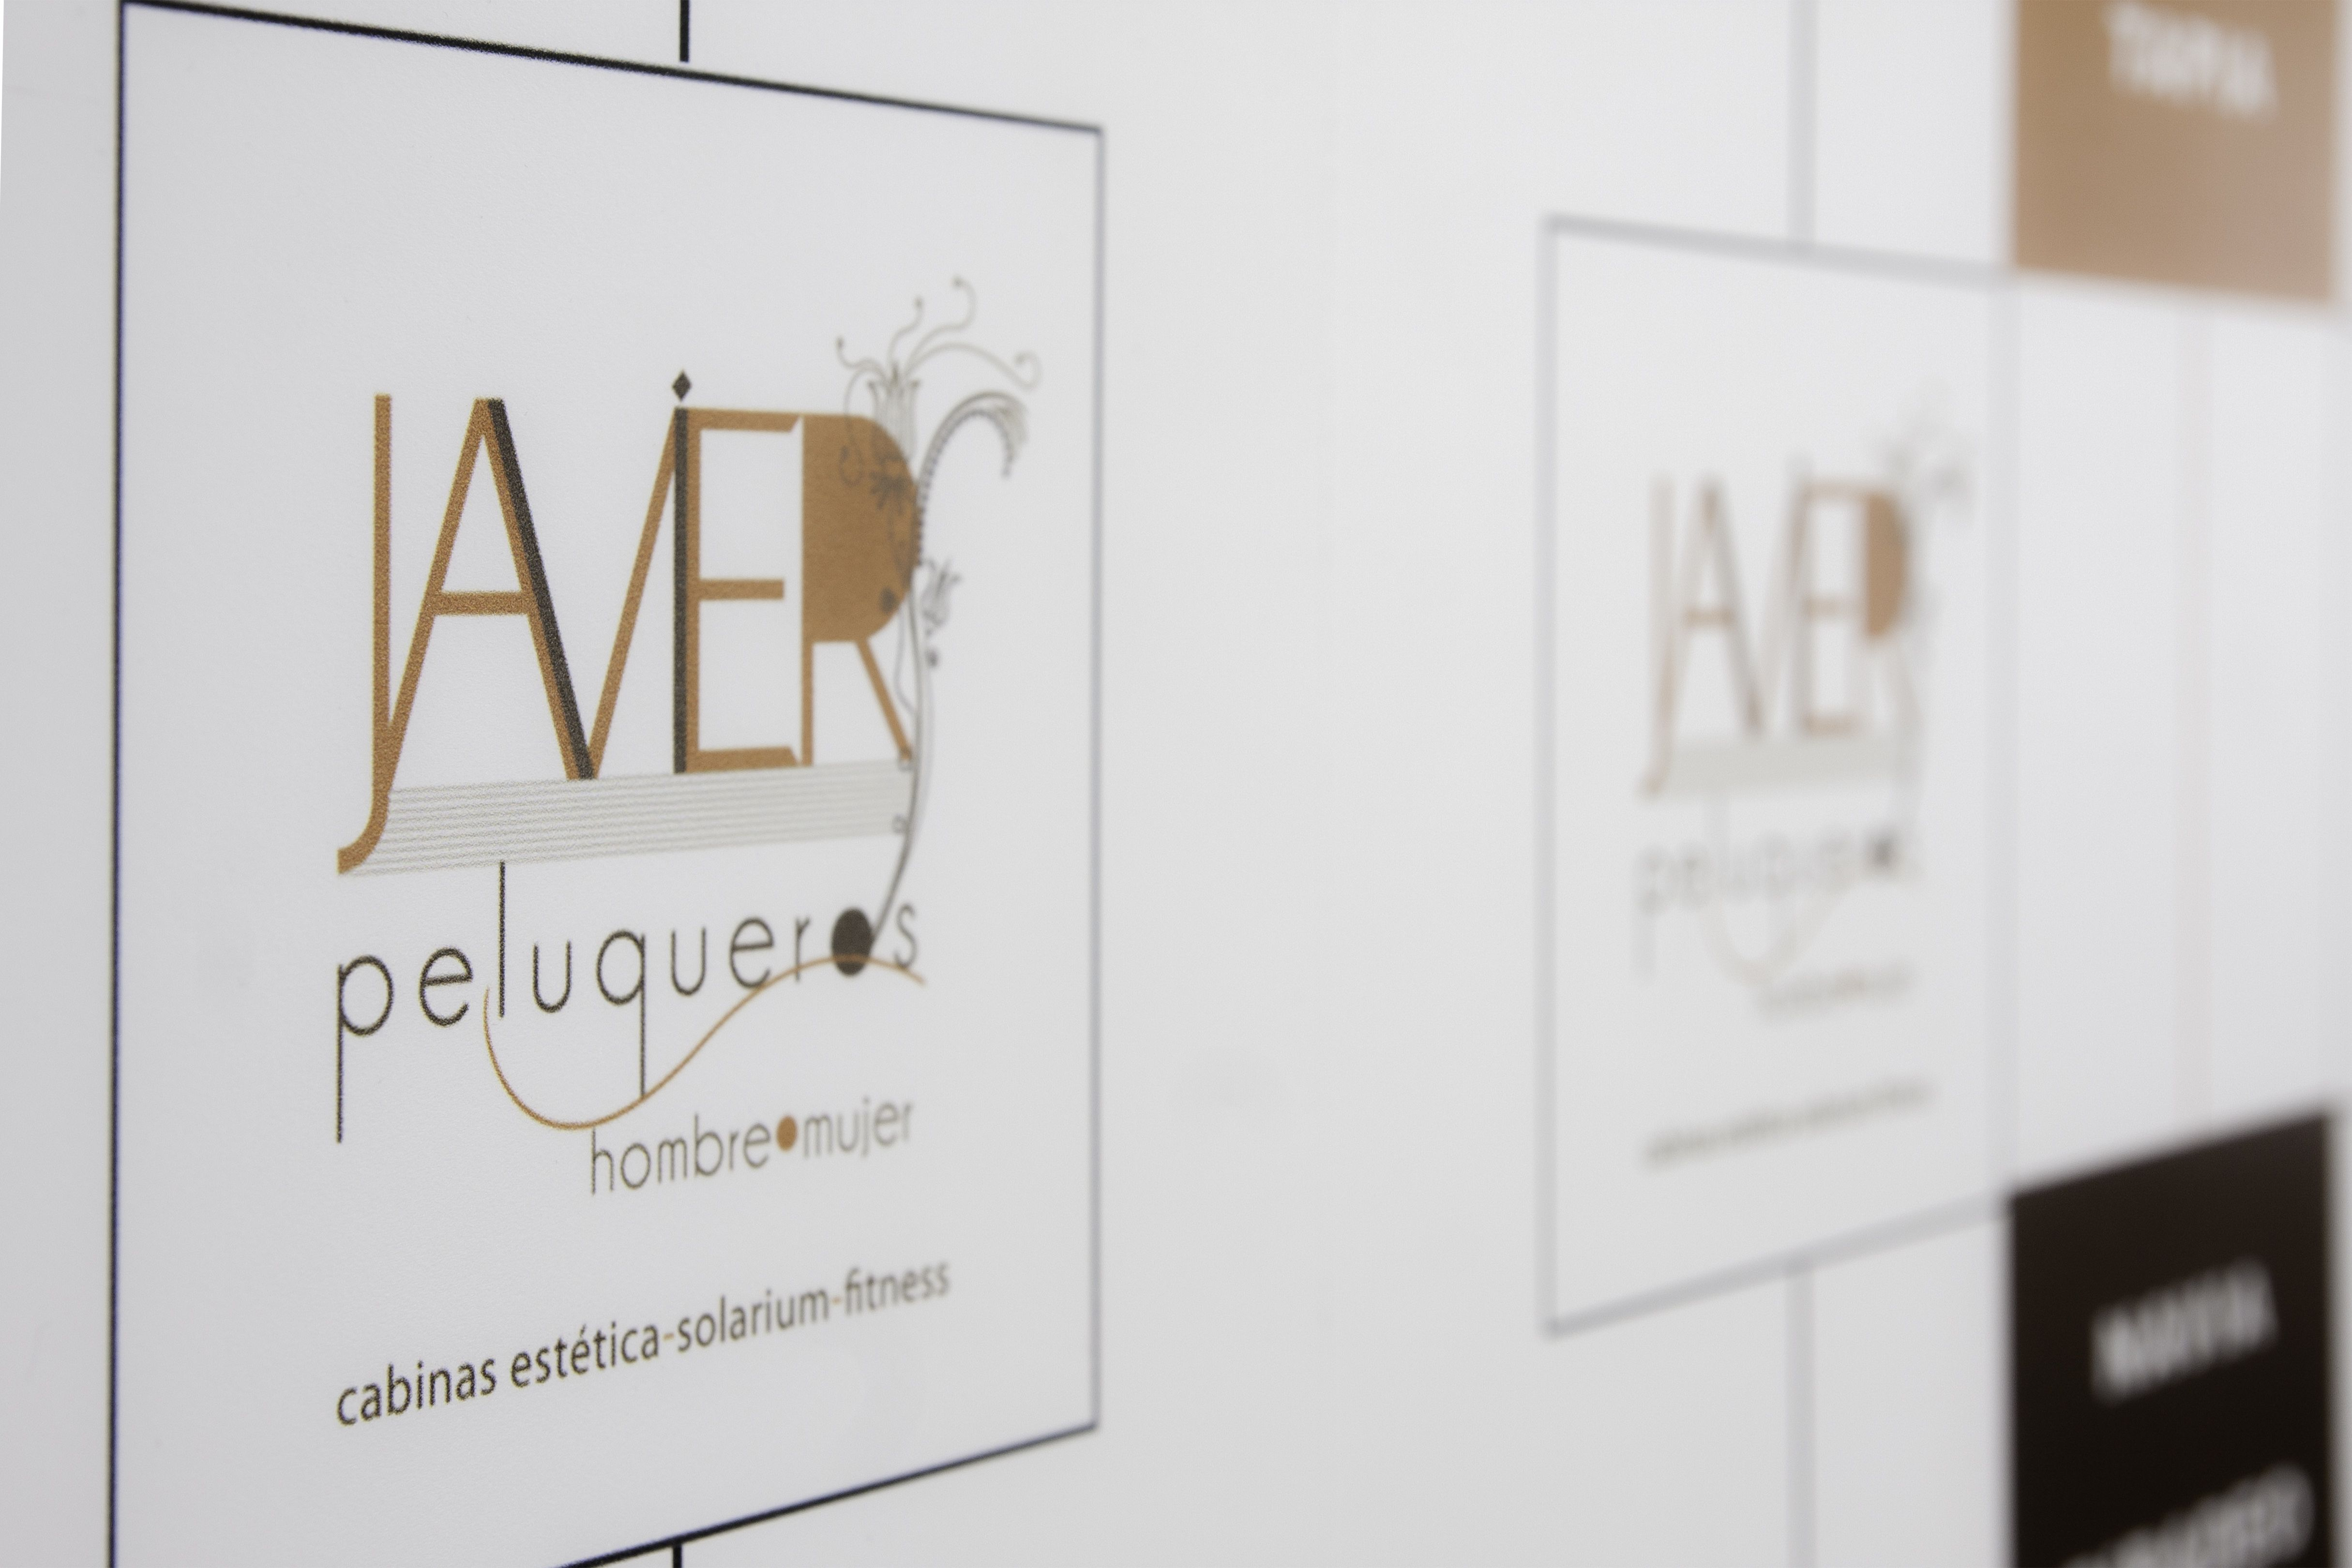 Logo publicitario de Javier Peluqueros